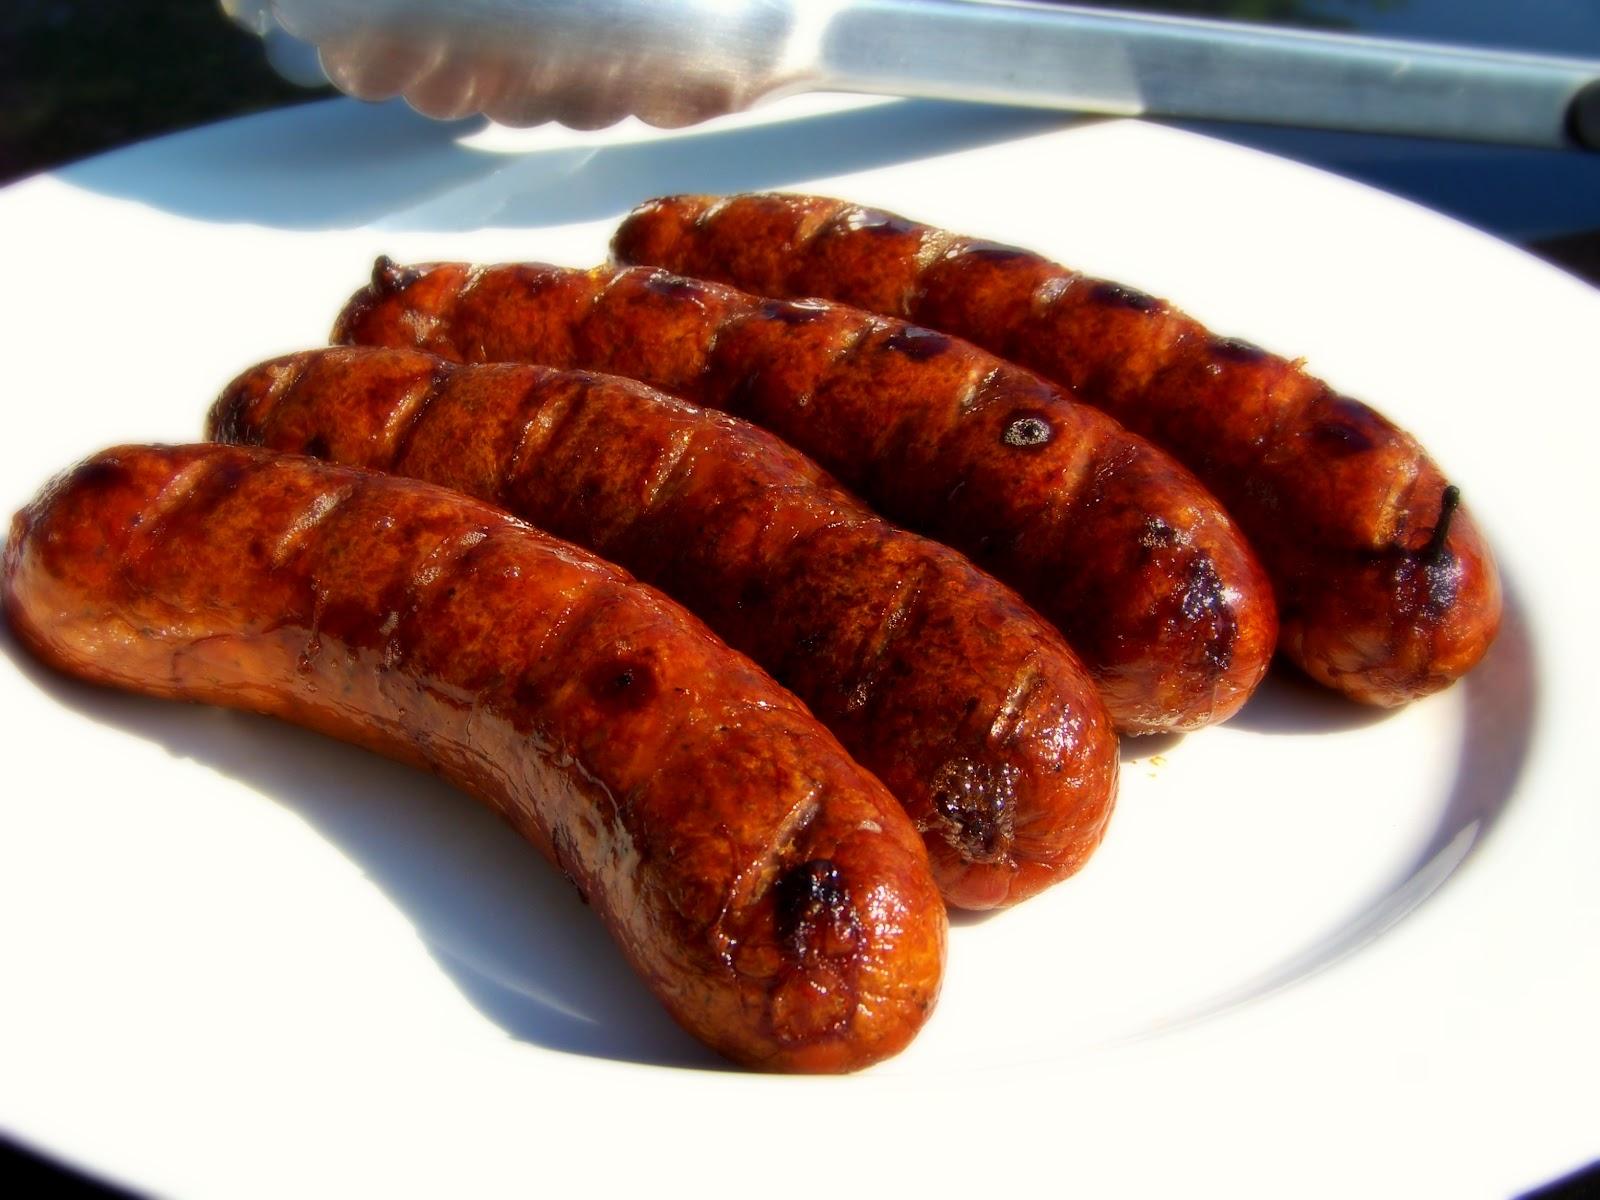 Desktop Wallpaper Sausage h350622 Food HD Images 1600x1200